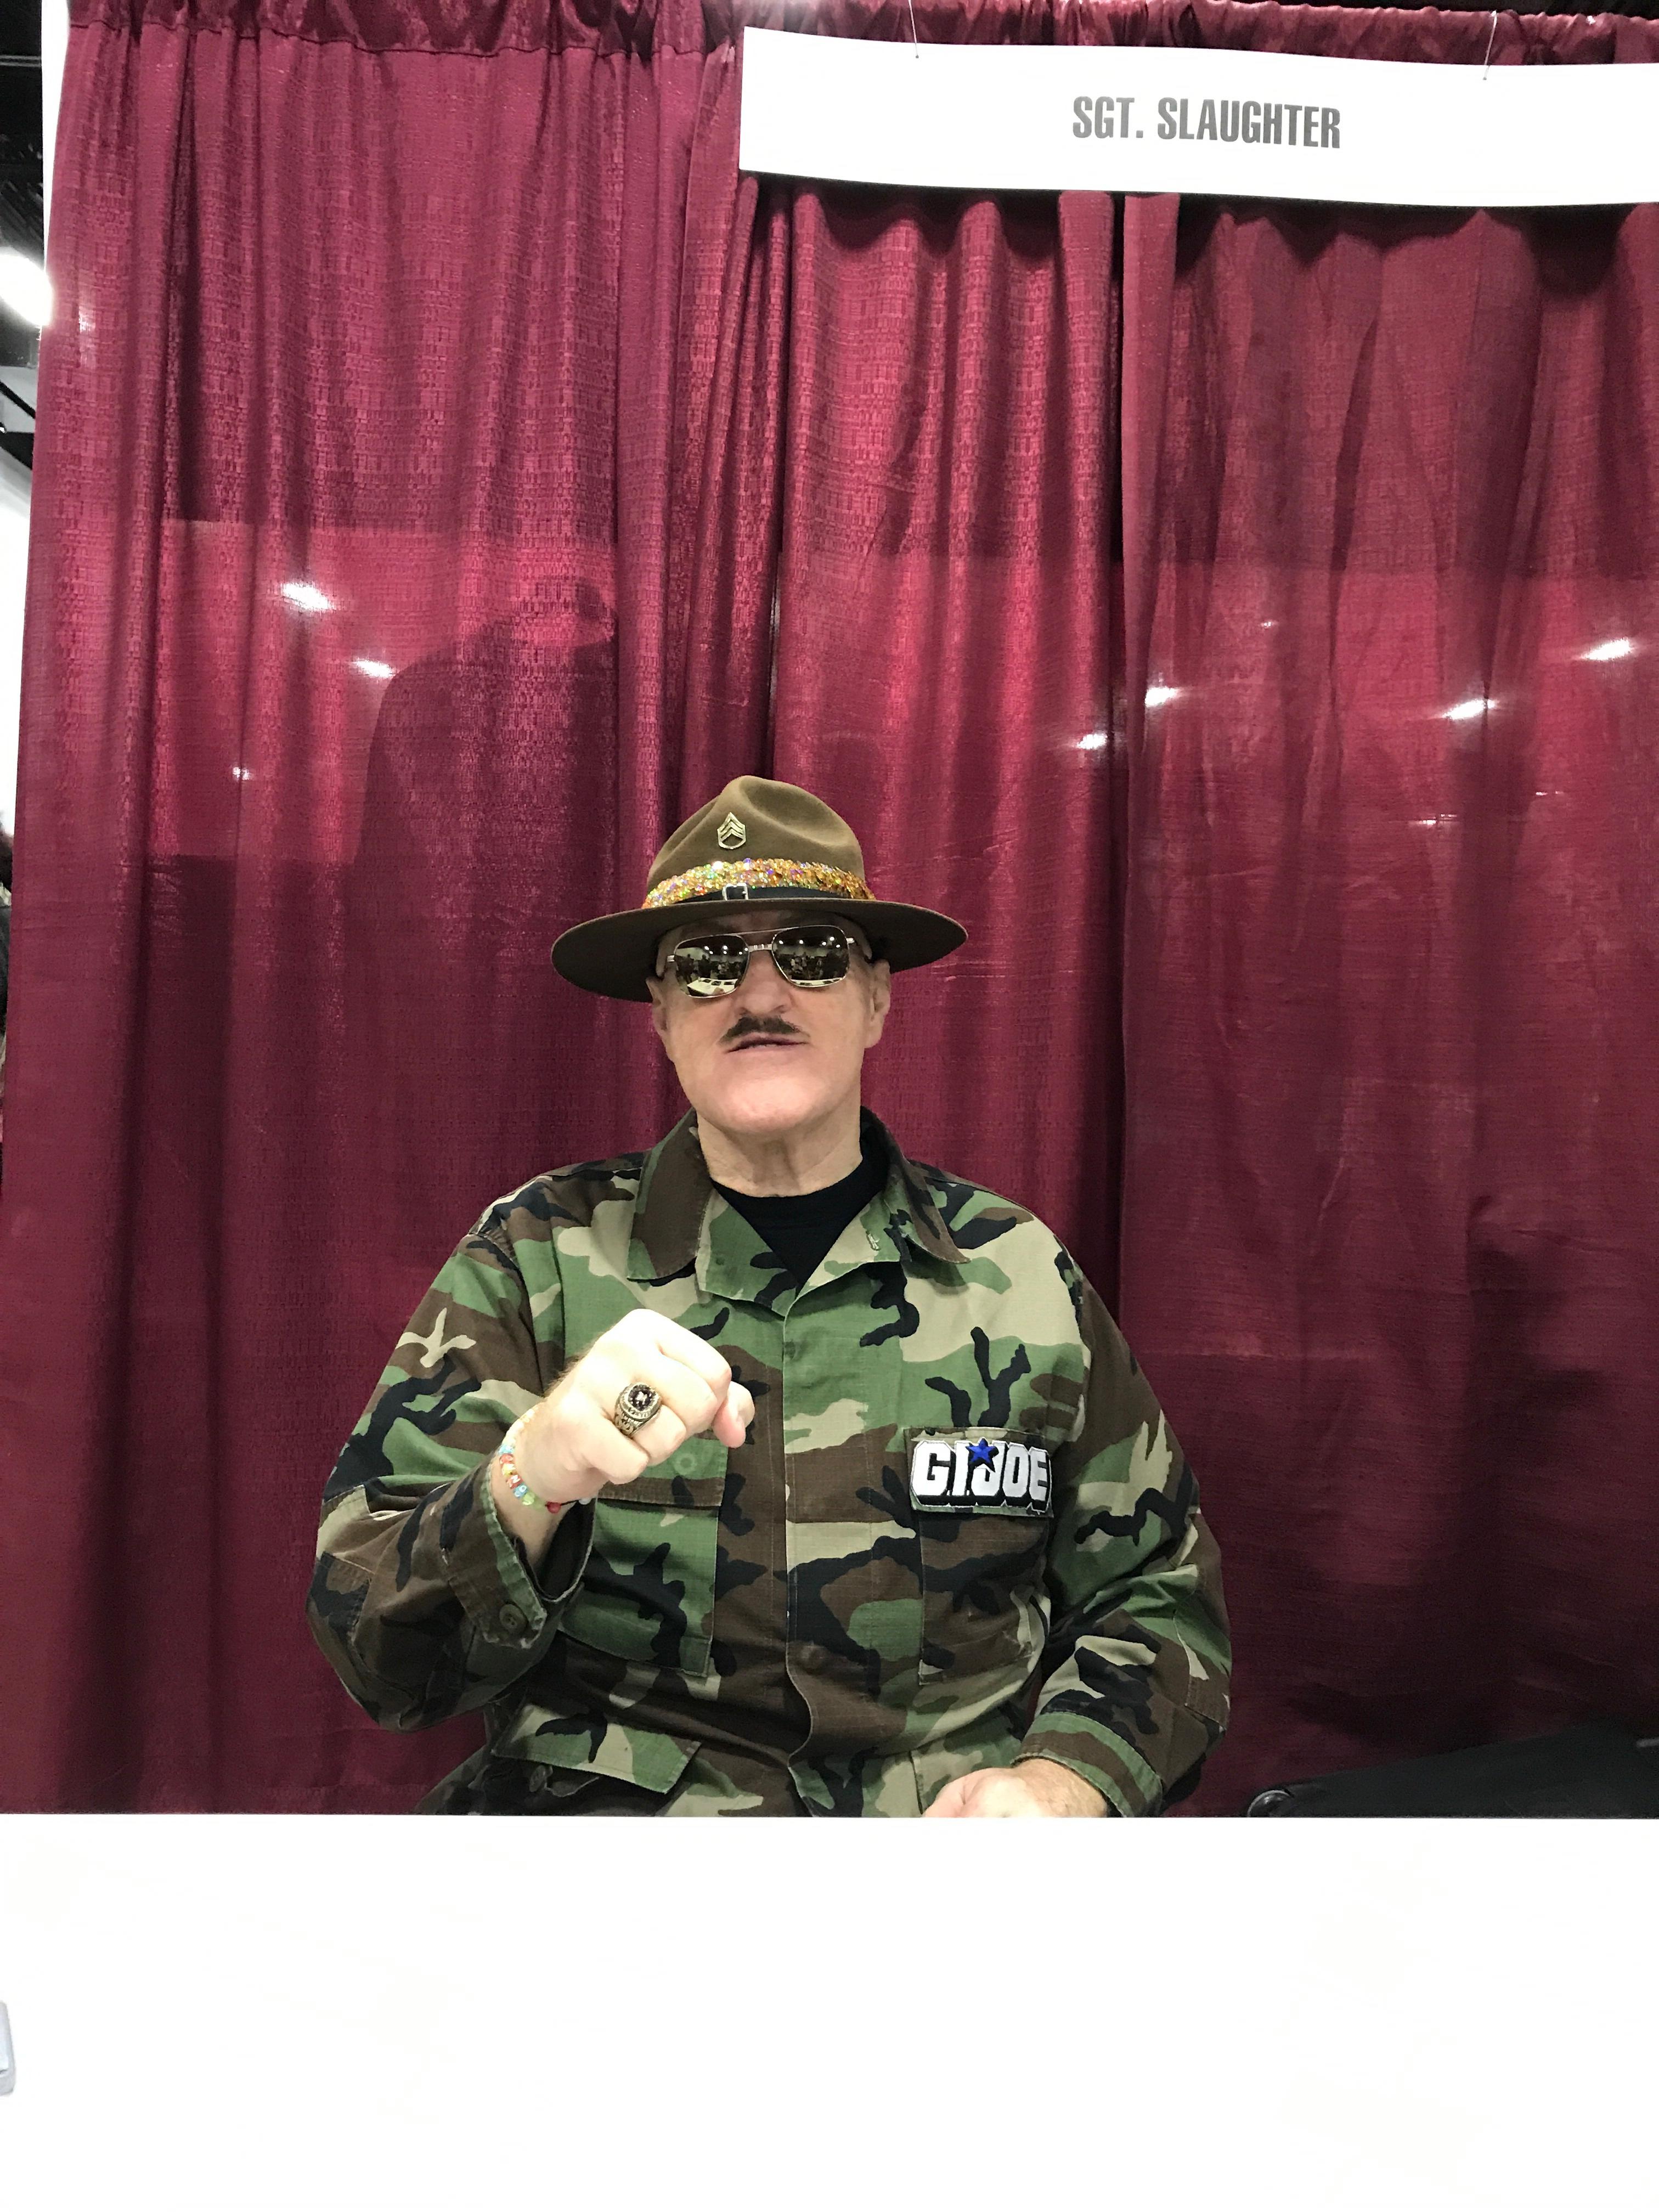 Sgt. Slaughter.